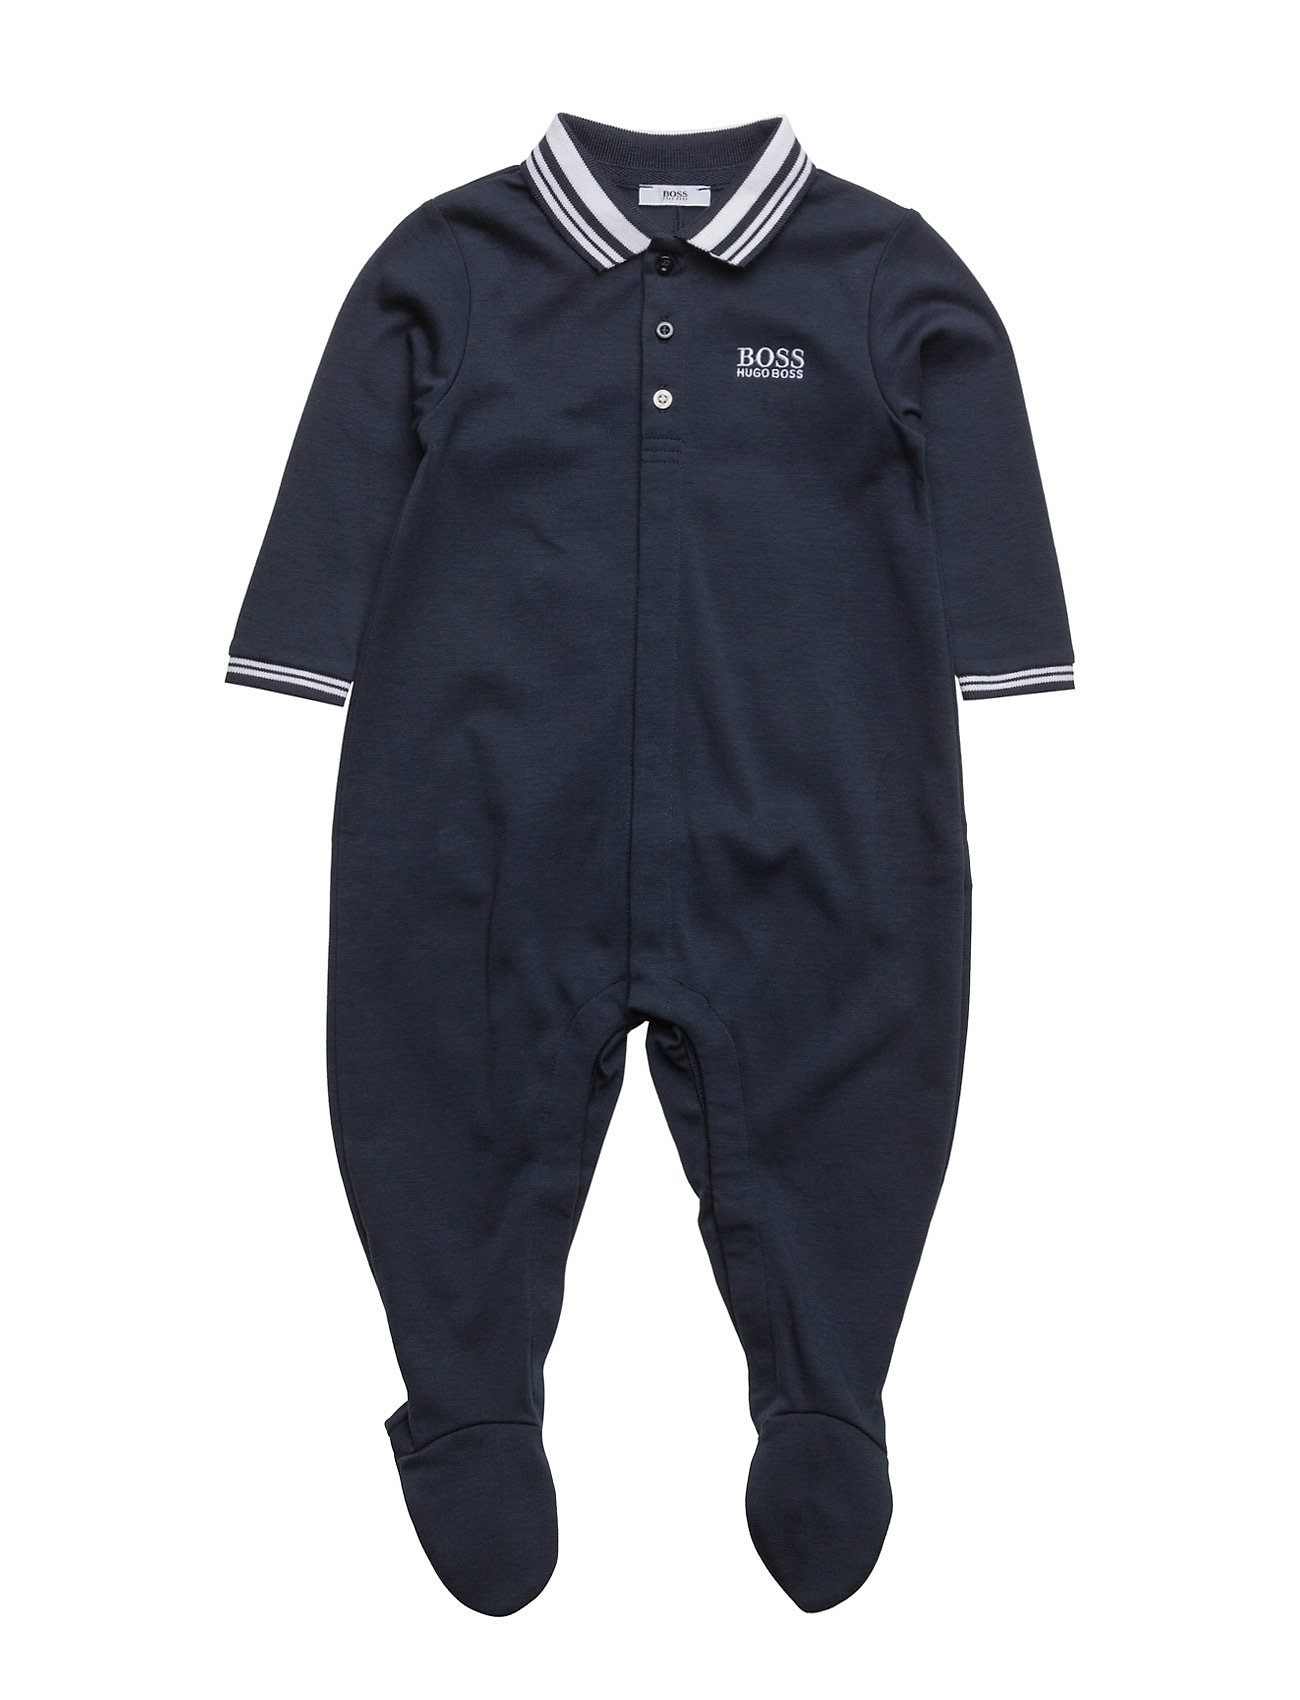 Pyjamas BOSS Pyjamas til Børn i Navy blå